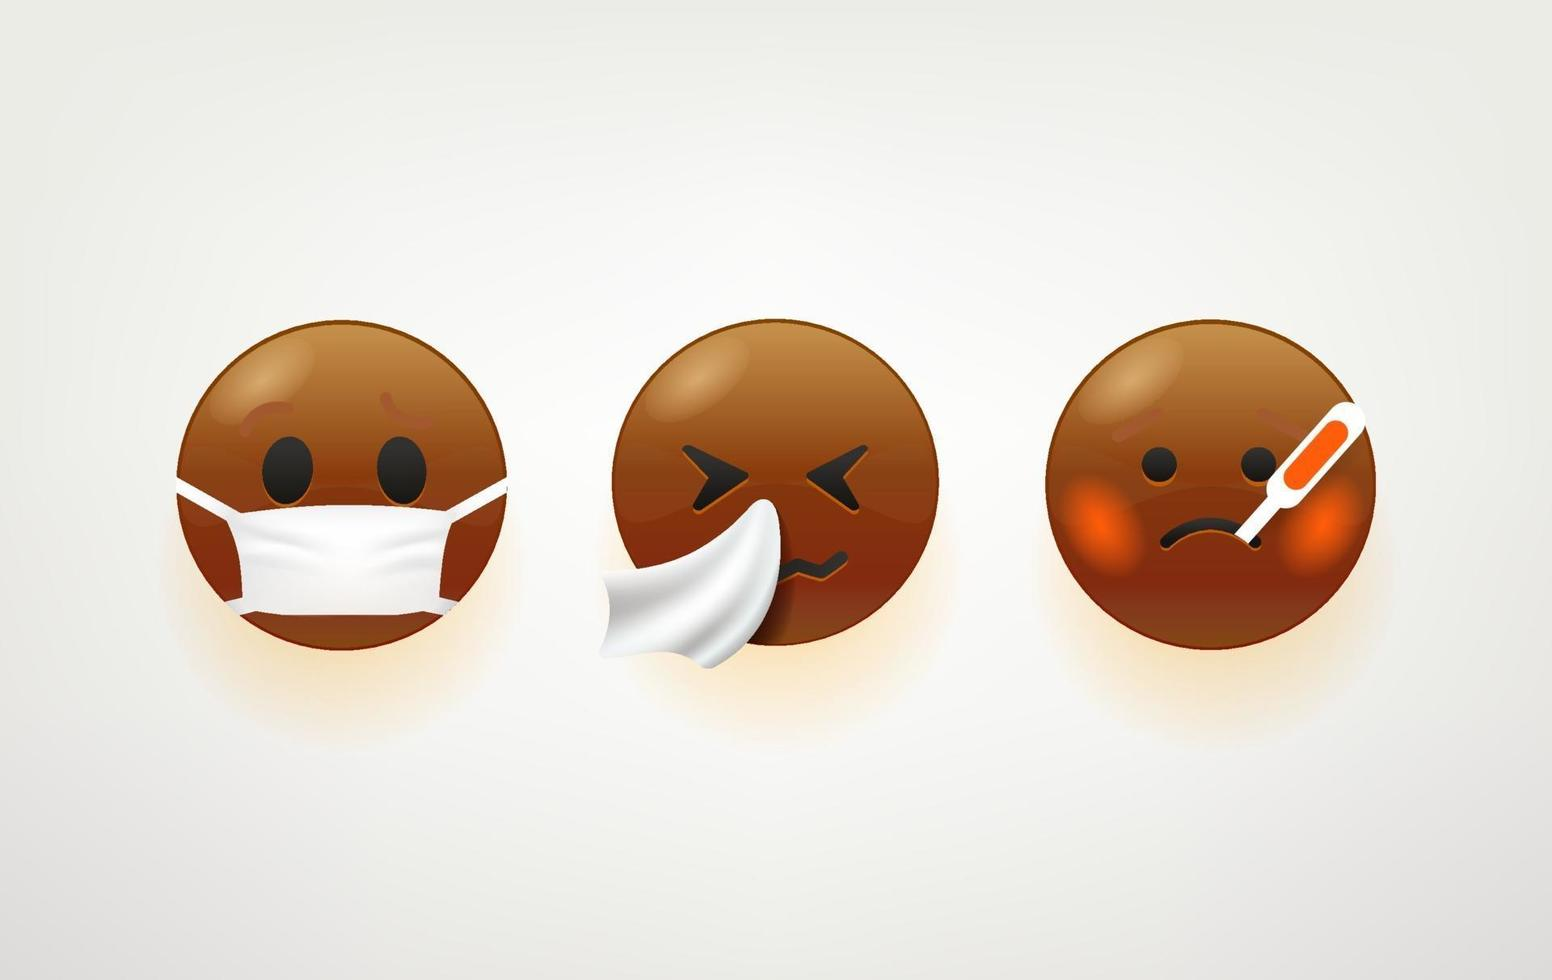 Dark skin emoji faces vector